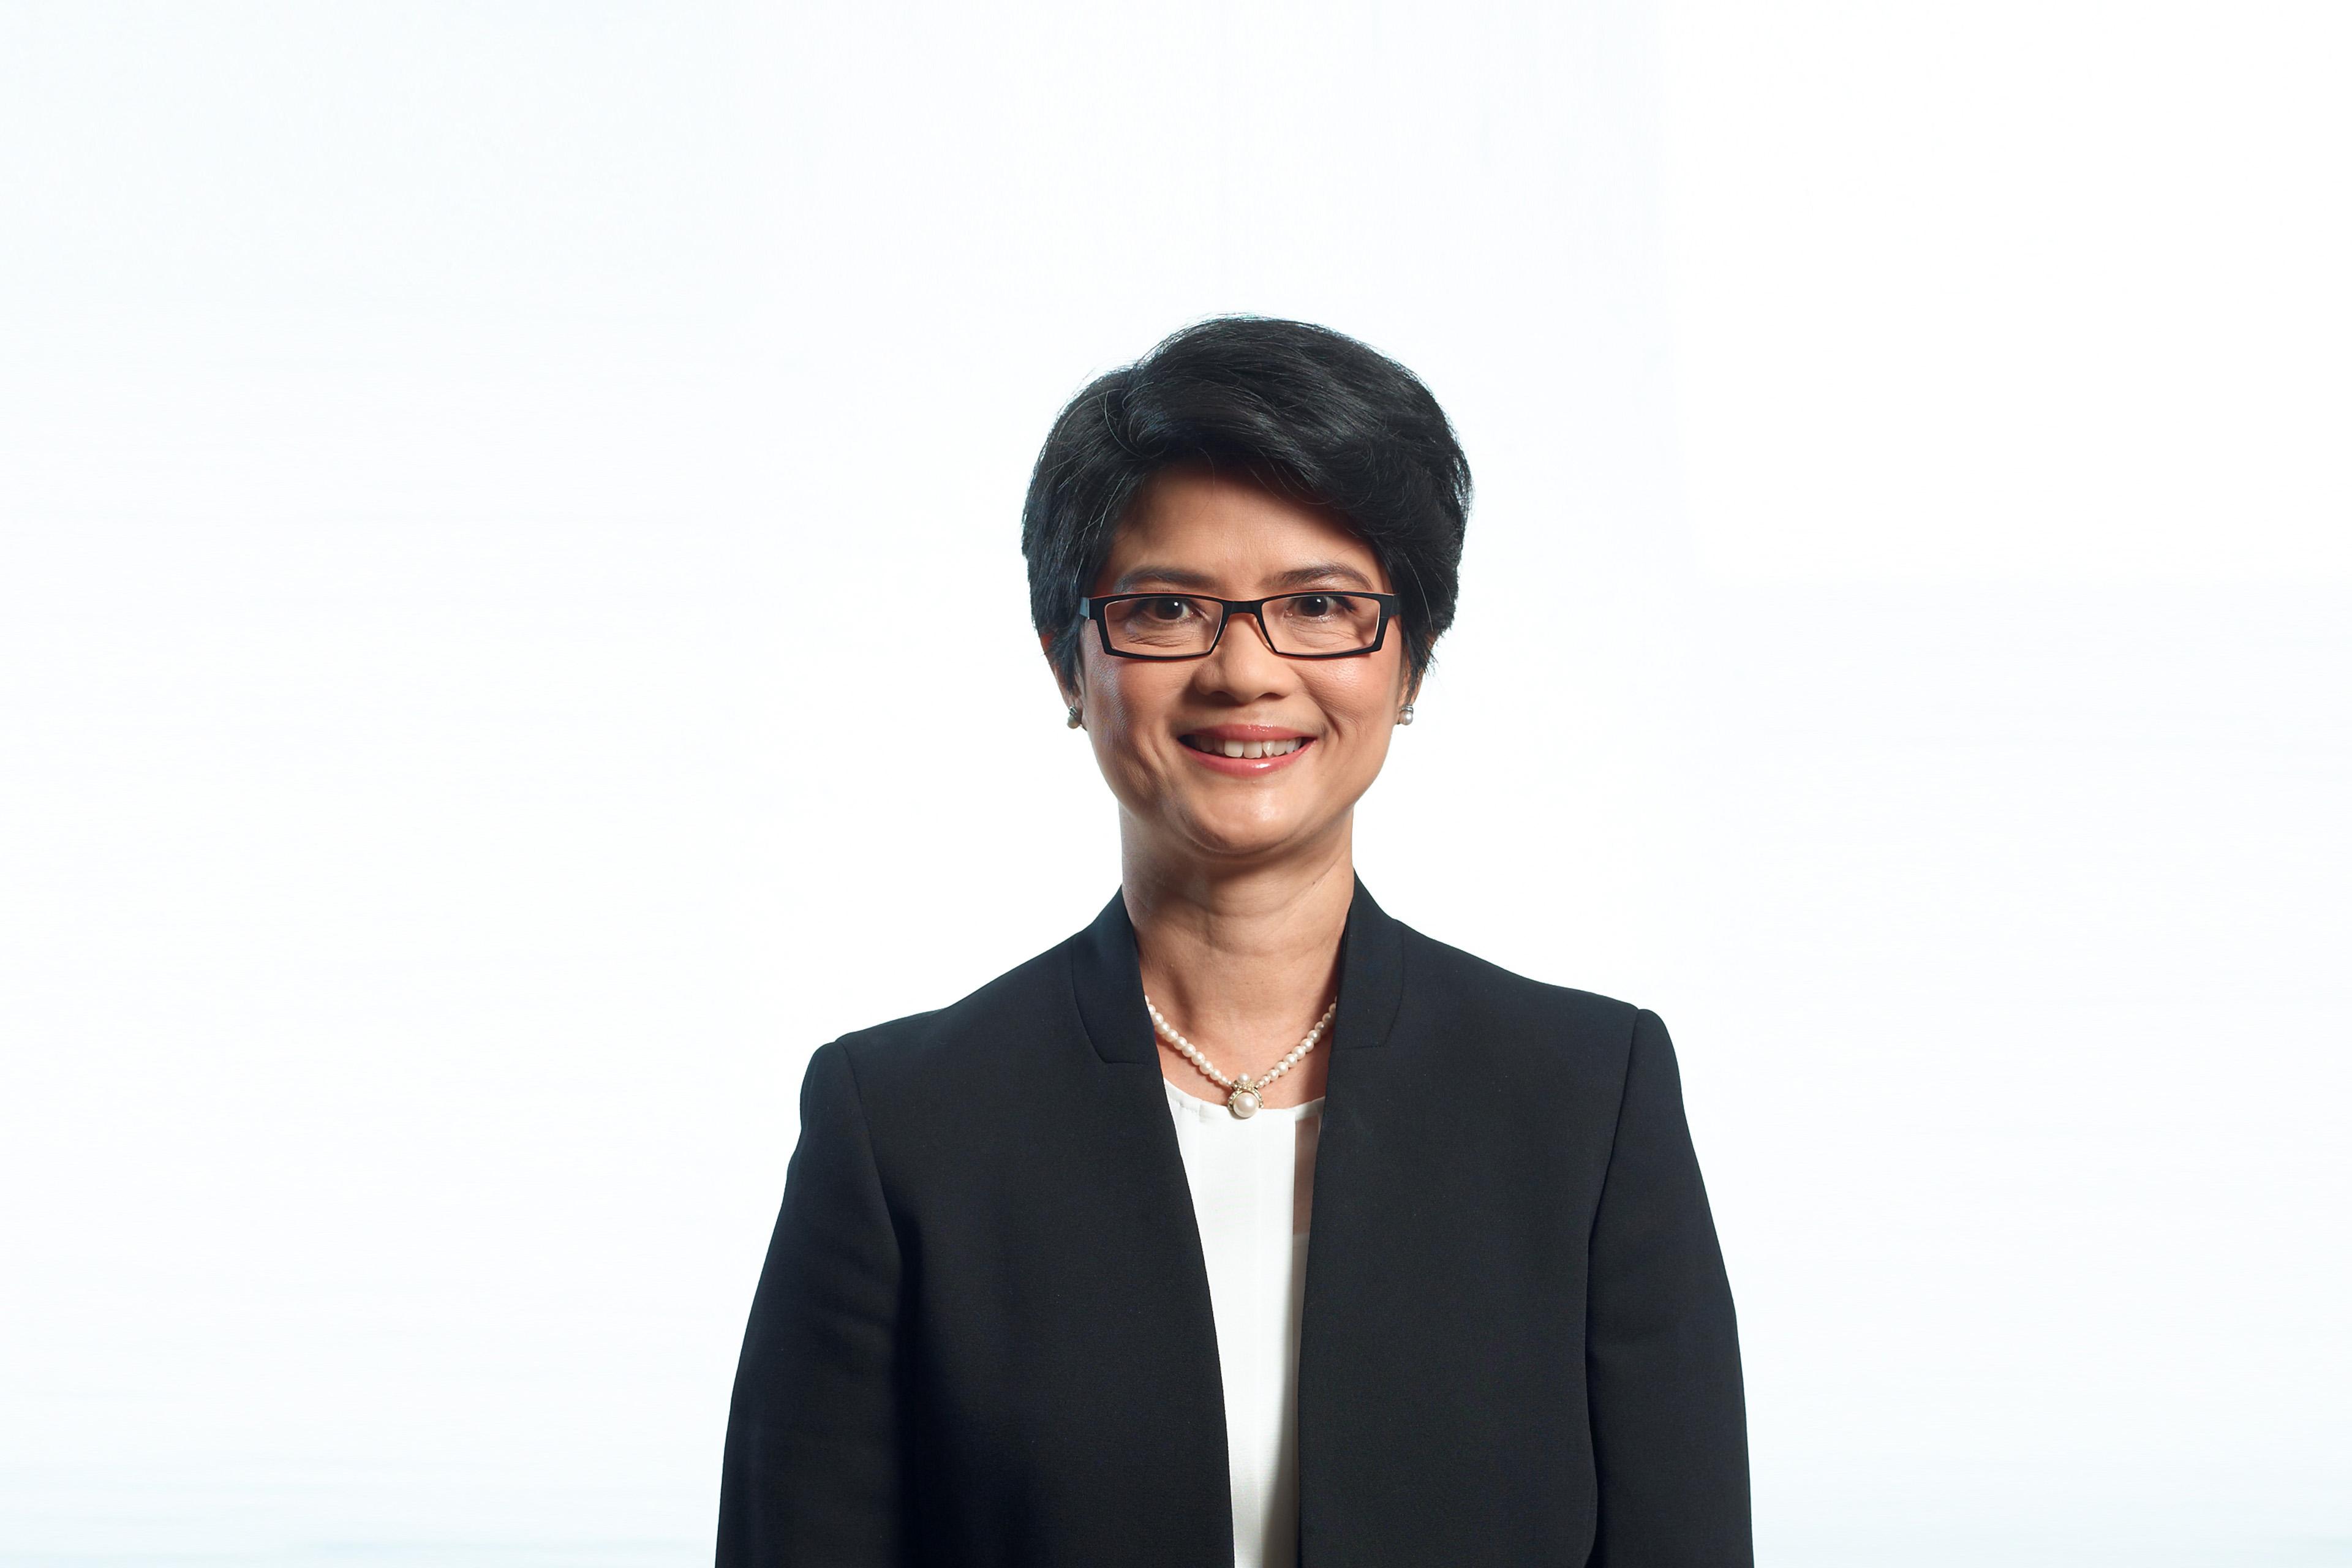 Irawati Setiady